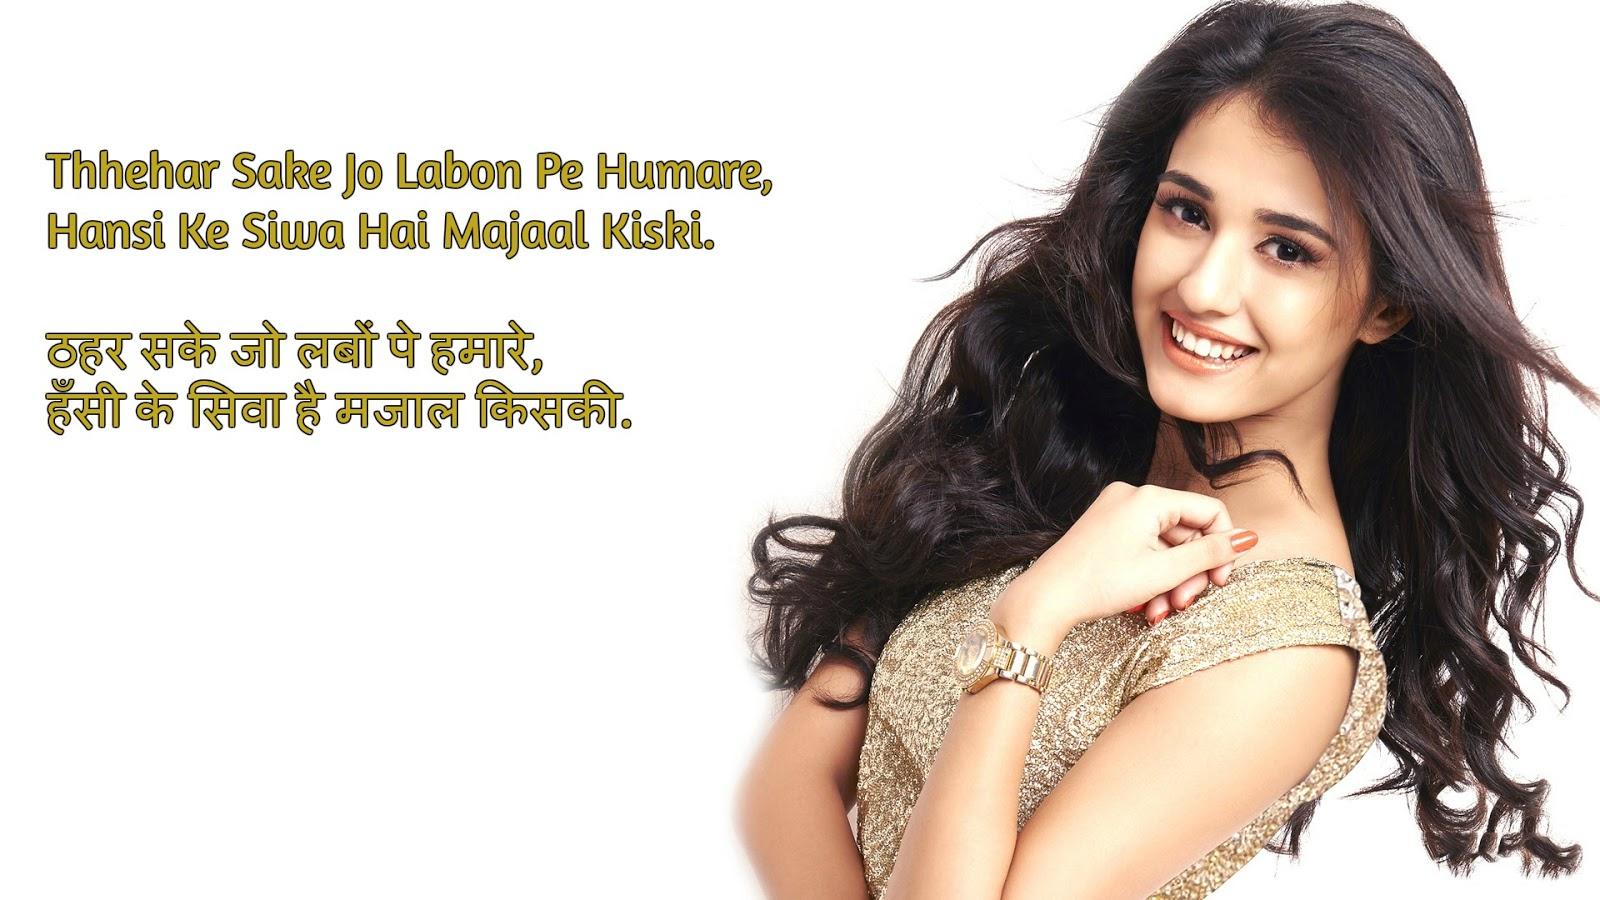 Hindi Quotes For Whatsapp Dp Girls Wwwgalleryneedcom